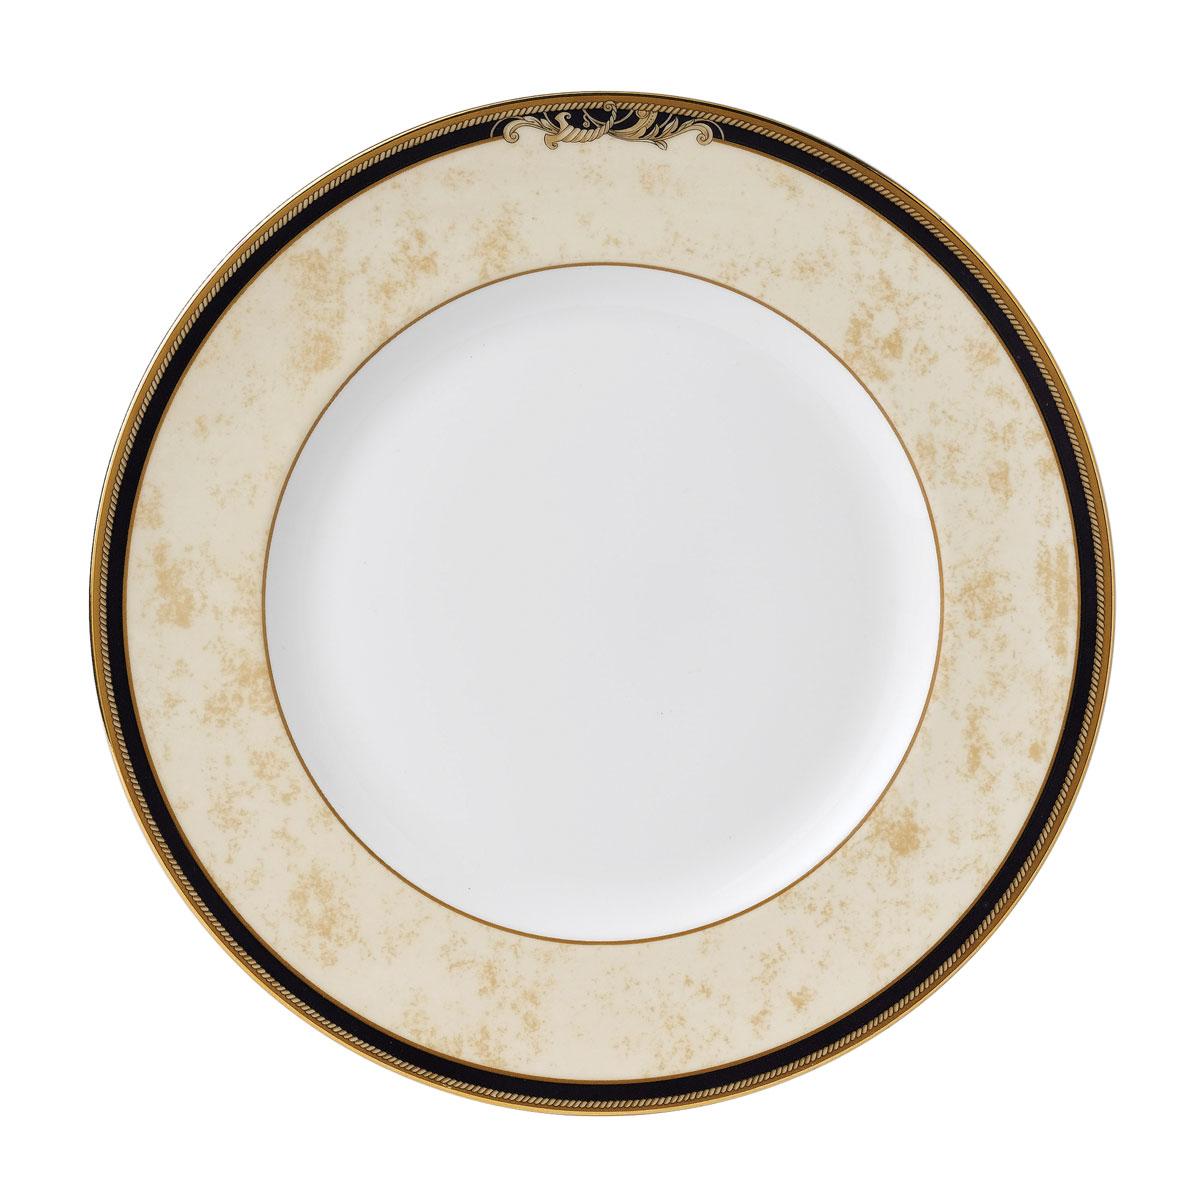 Wedgwood Cornucopia Dinner Plate, Single